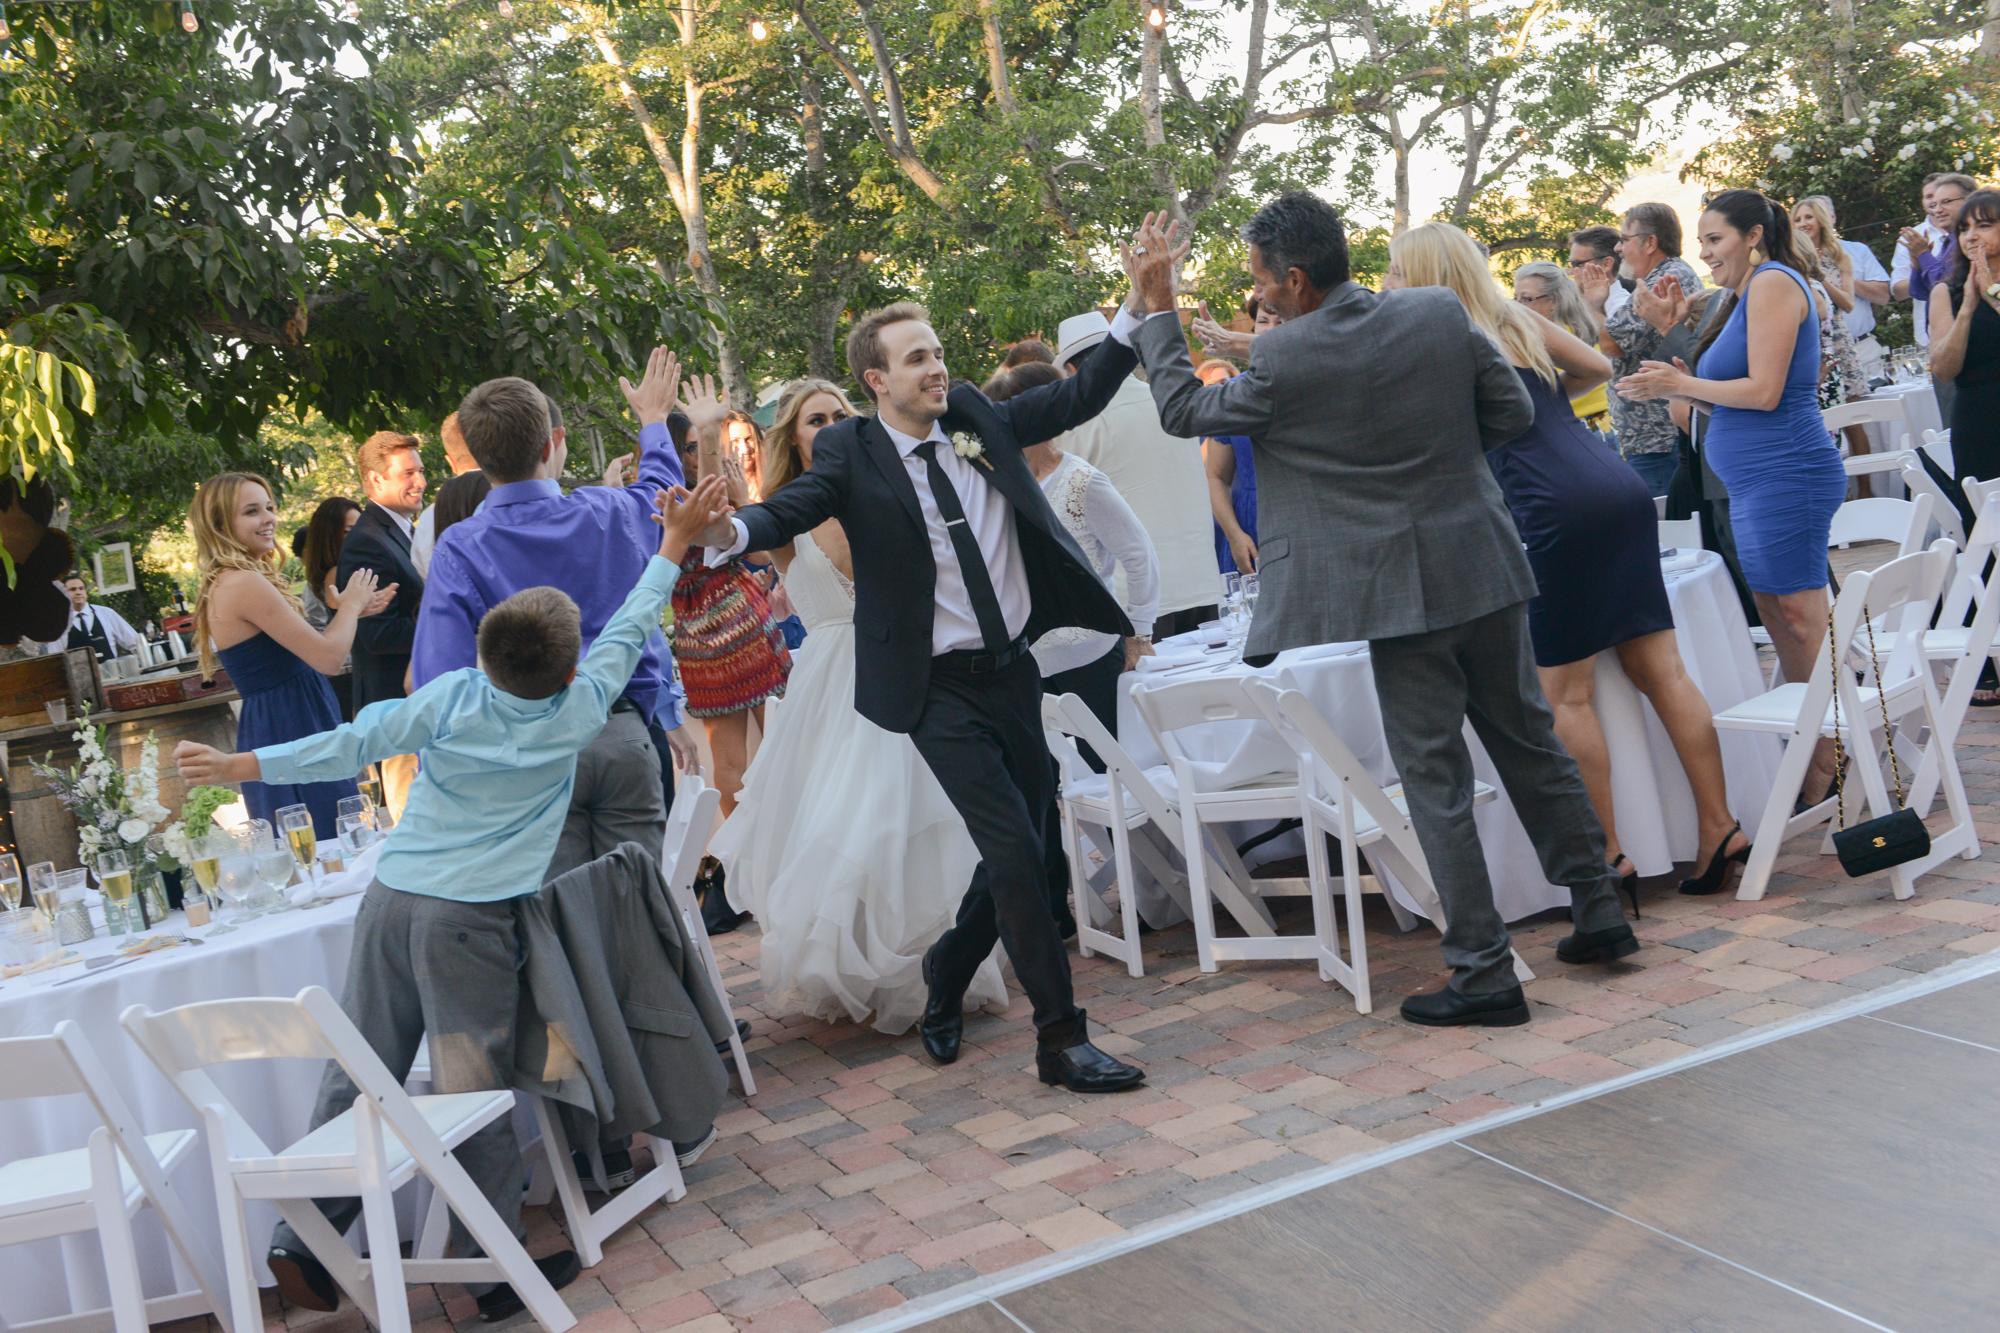 arthousephotographs.com | Walnut Grove Wedding California | Los Angeles Wedding Photographer | Southern California Wedding Photographer | Arthouse Photographs